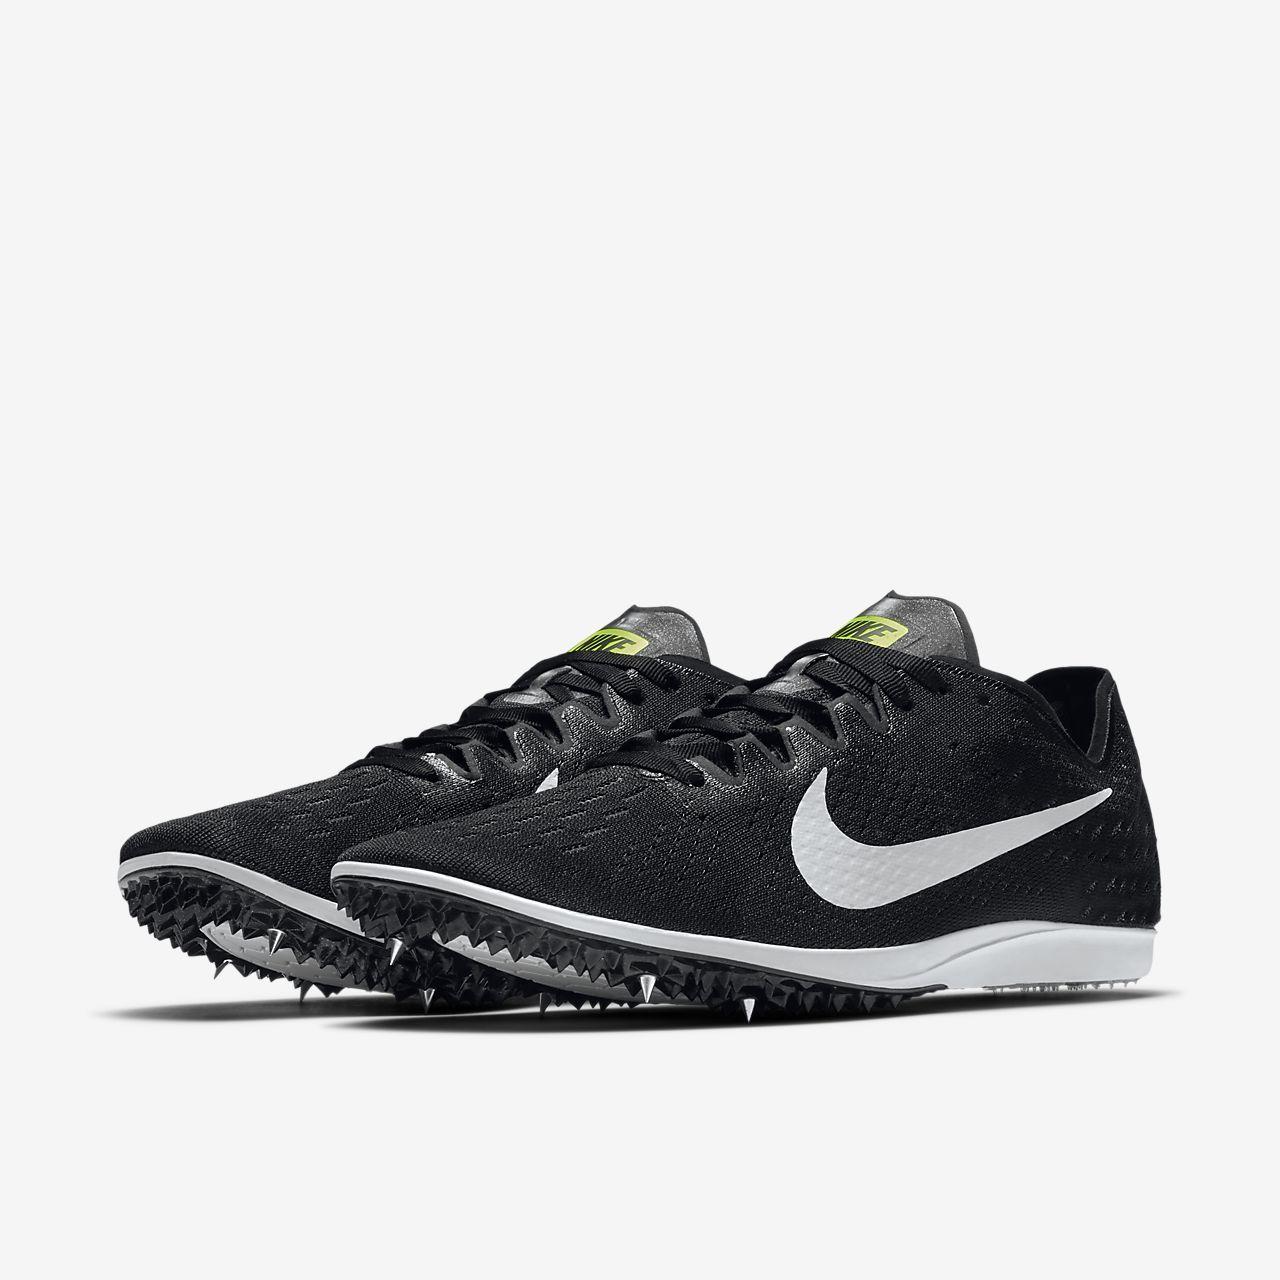 Nike Zoom Matumbo 3 Men's Running Shoes Black/Green/White eZ2376W